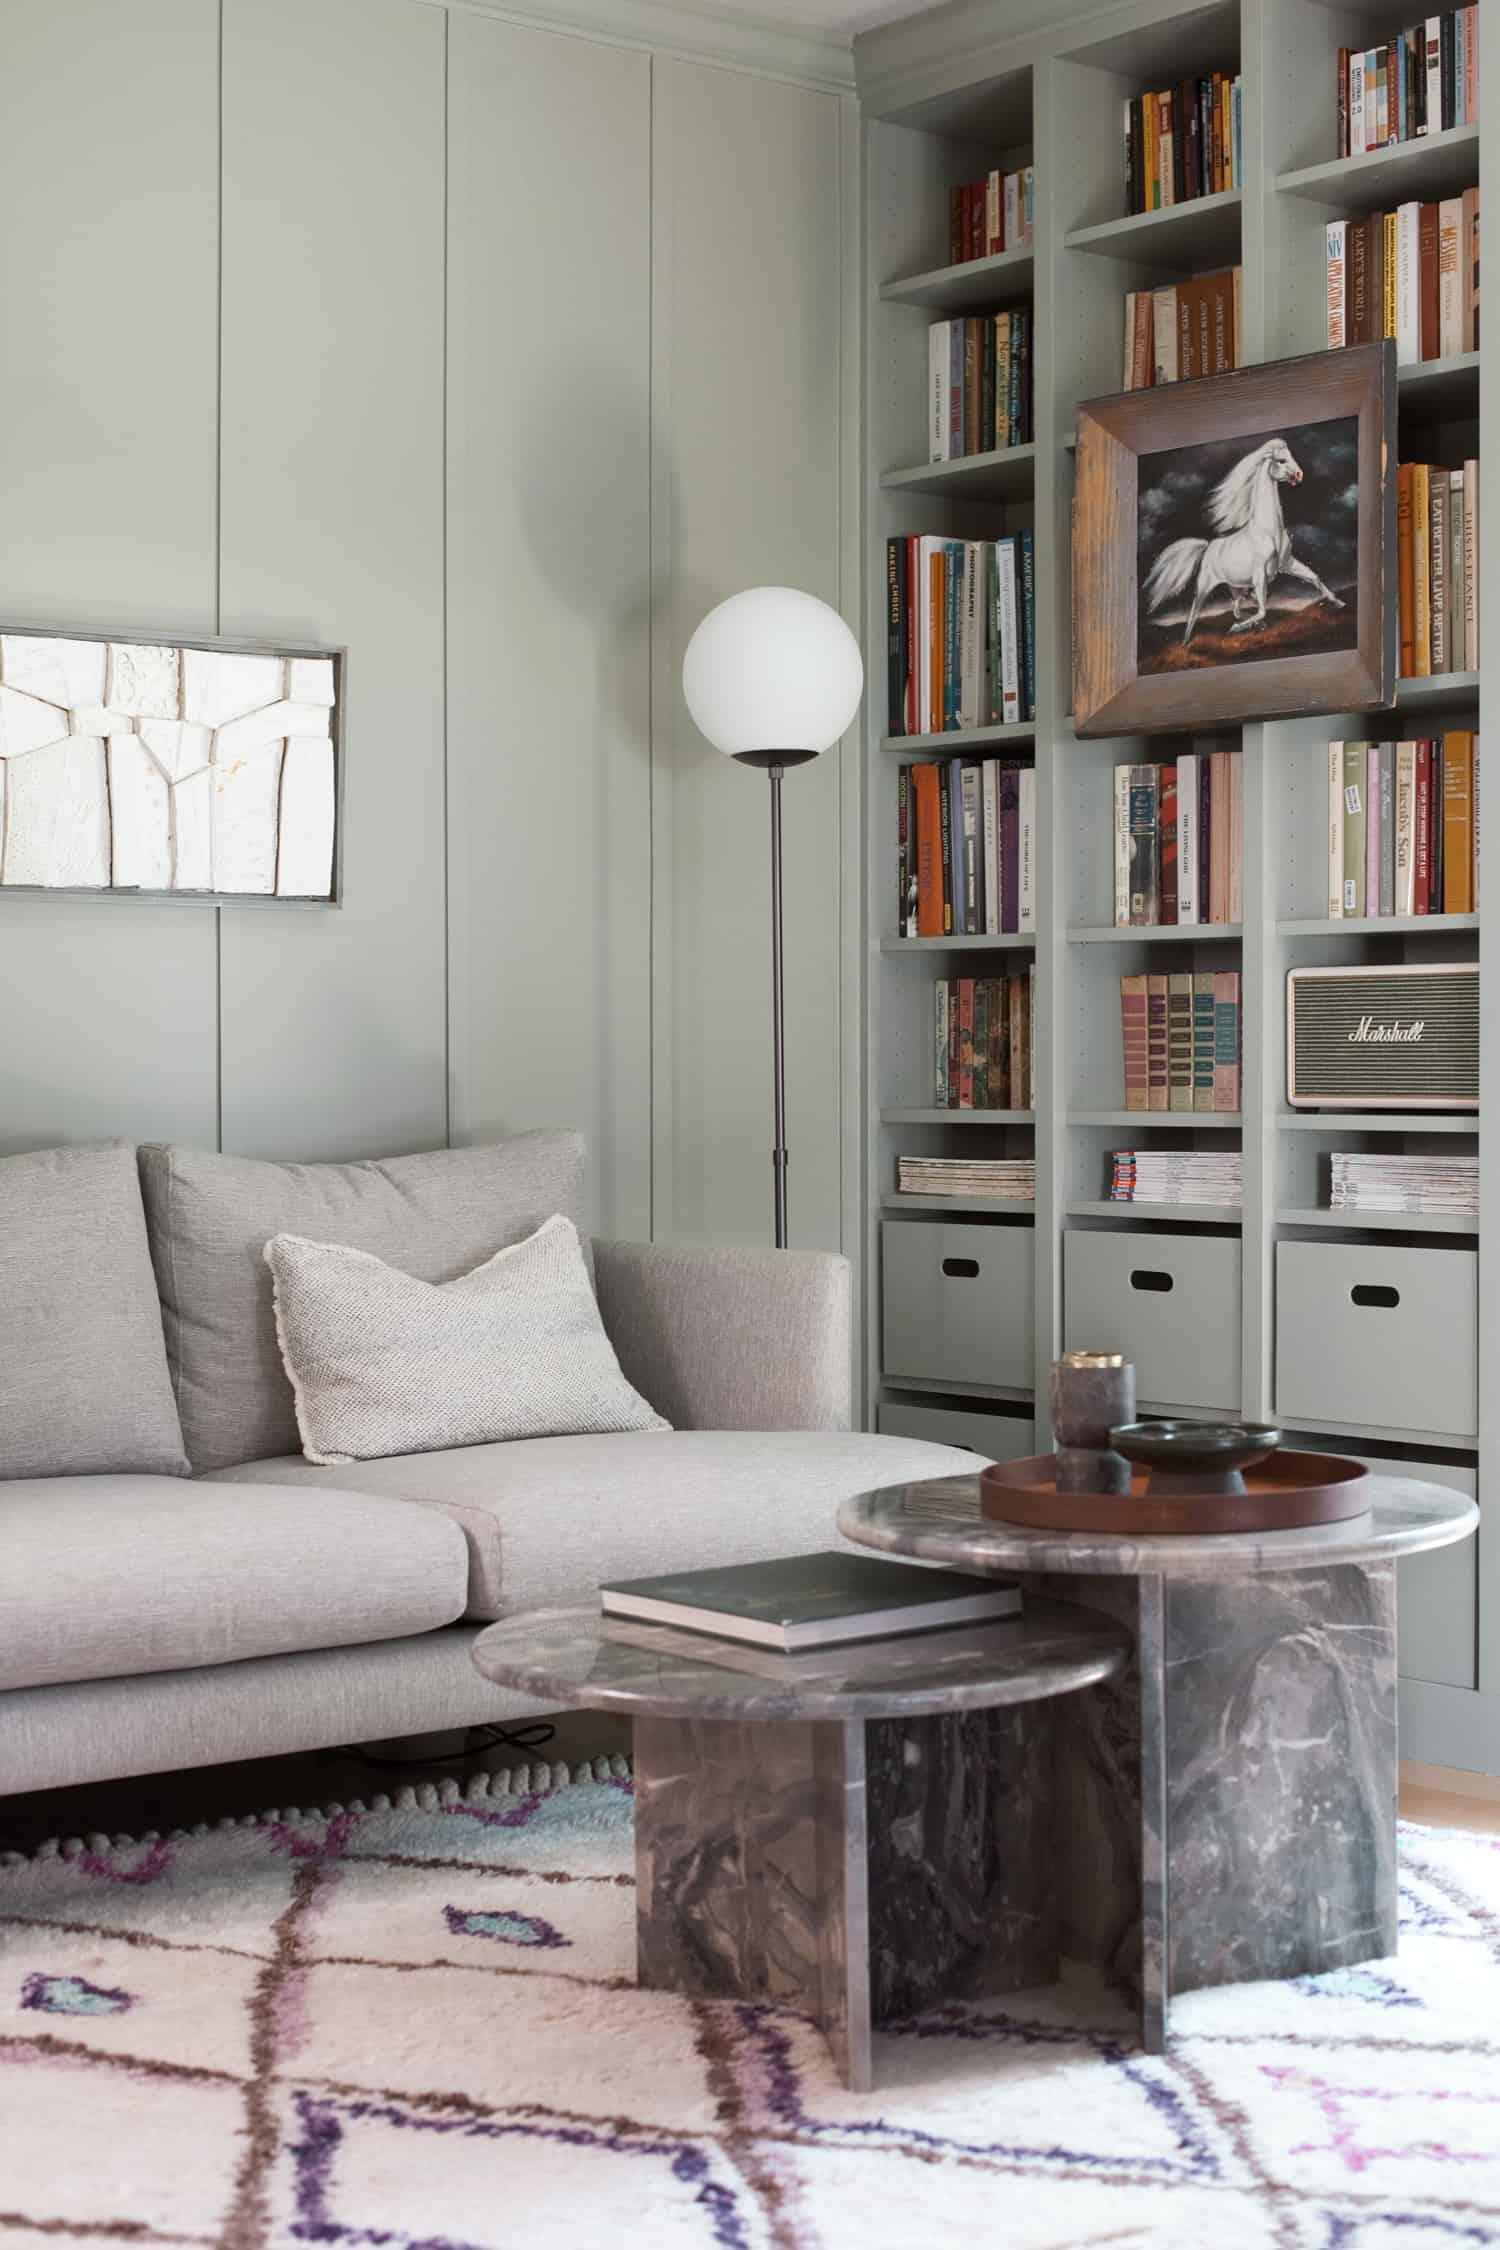 Home Library Makeover —DIY Bookshelves